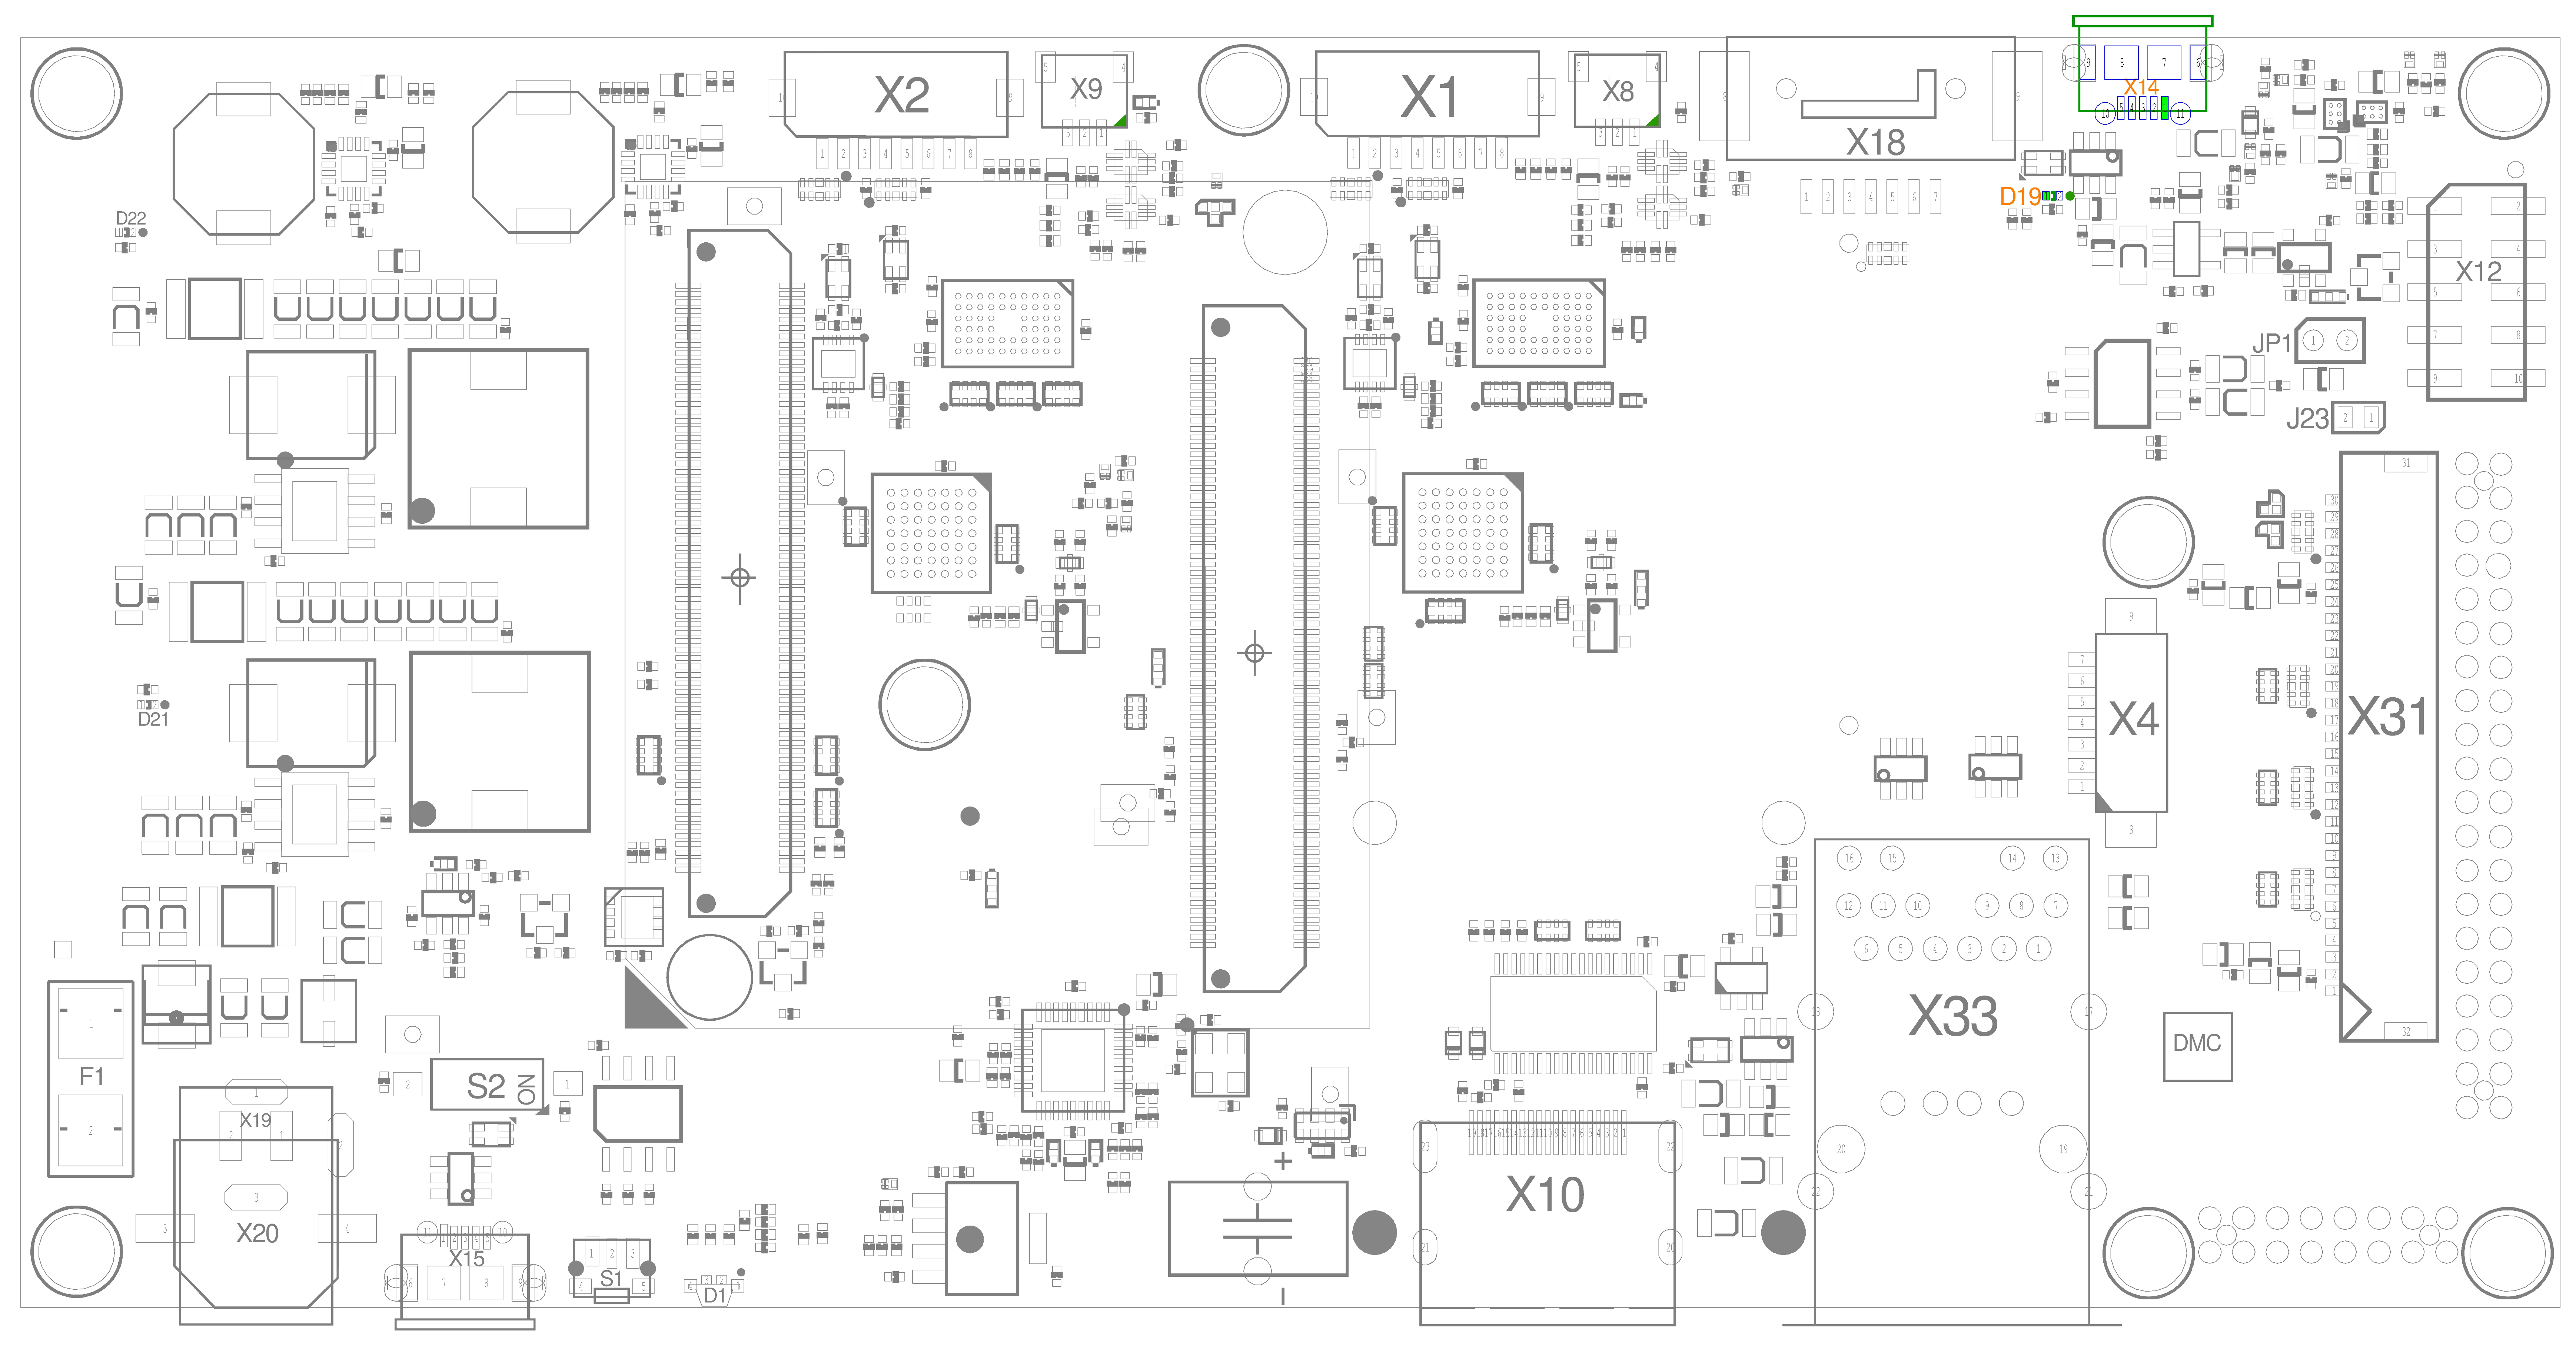 USB OTG (X14) with LED (D19)